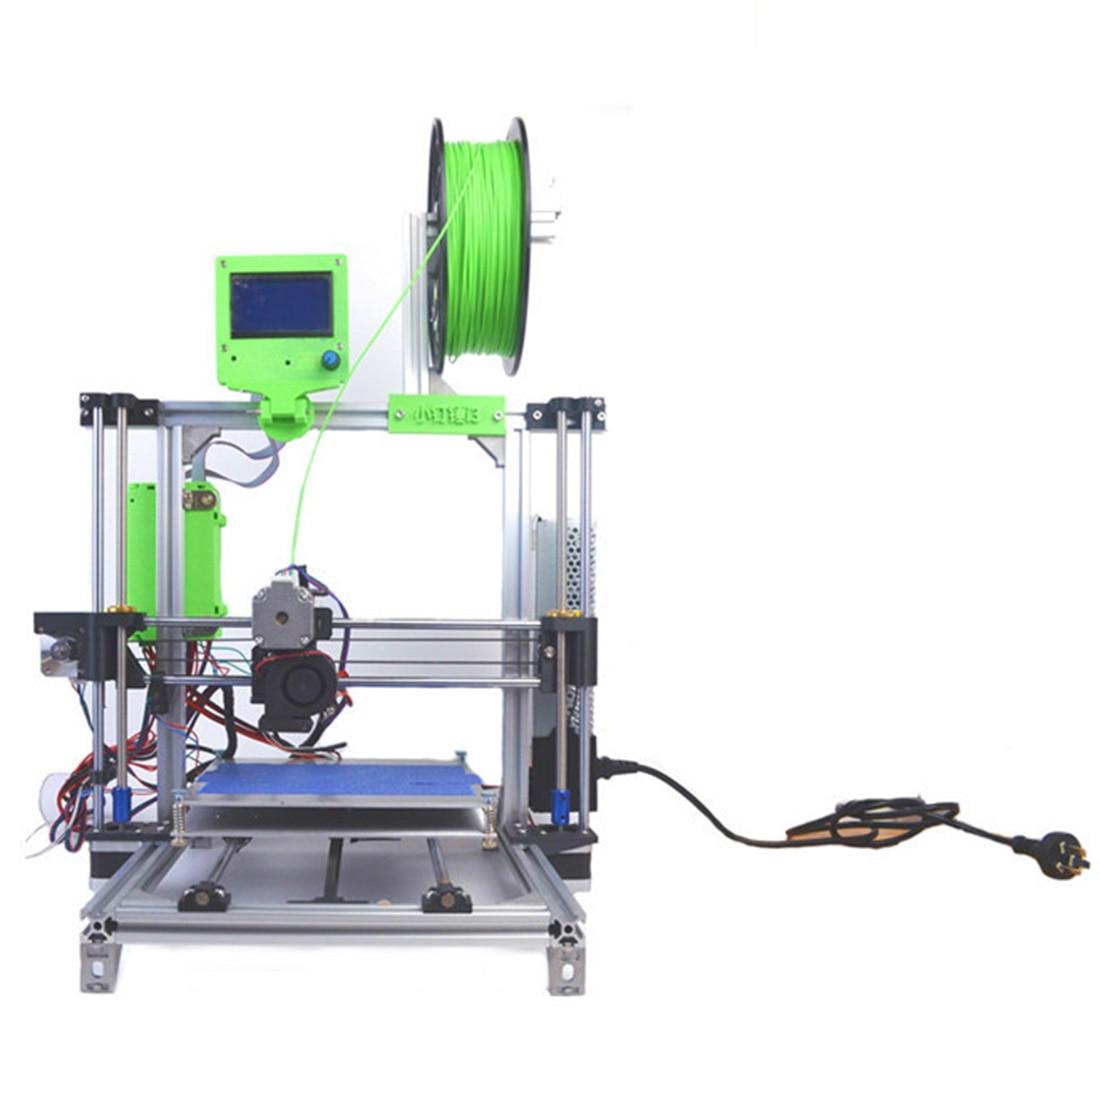 Hot DIY 3D Printer Upgraded Aluminum Frame Printing Kit For Children Kids Developmental Early Educational Toys Birthday Gifts